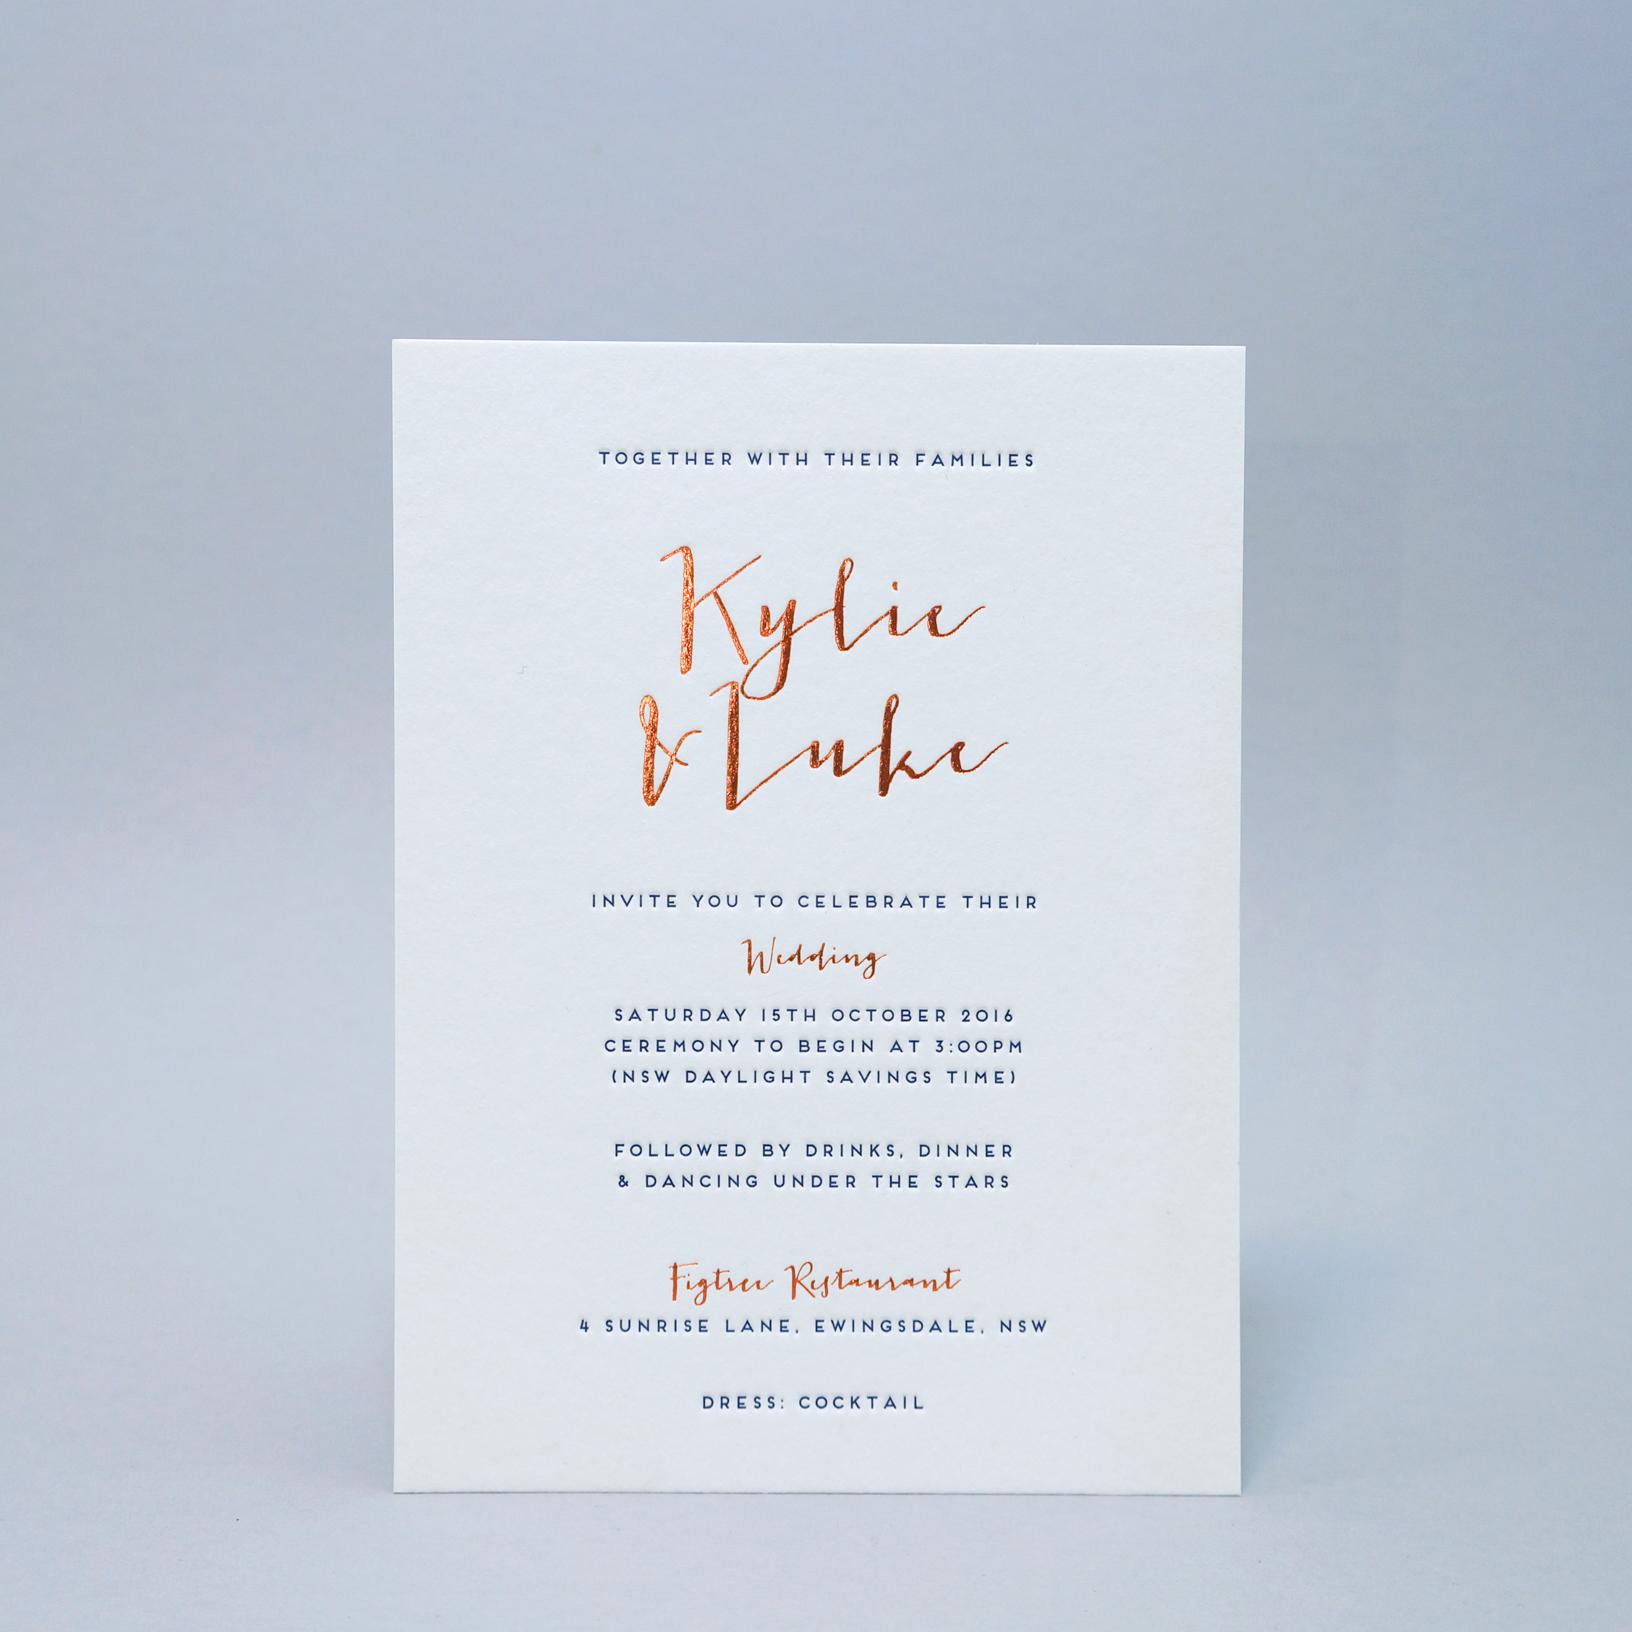 Letterpress-wedding-invitations-copper-foil-navy-1